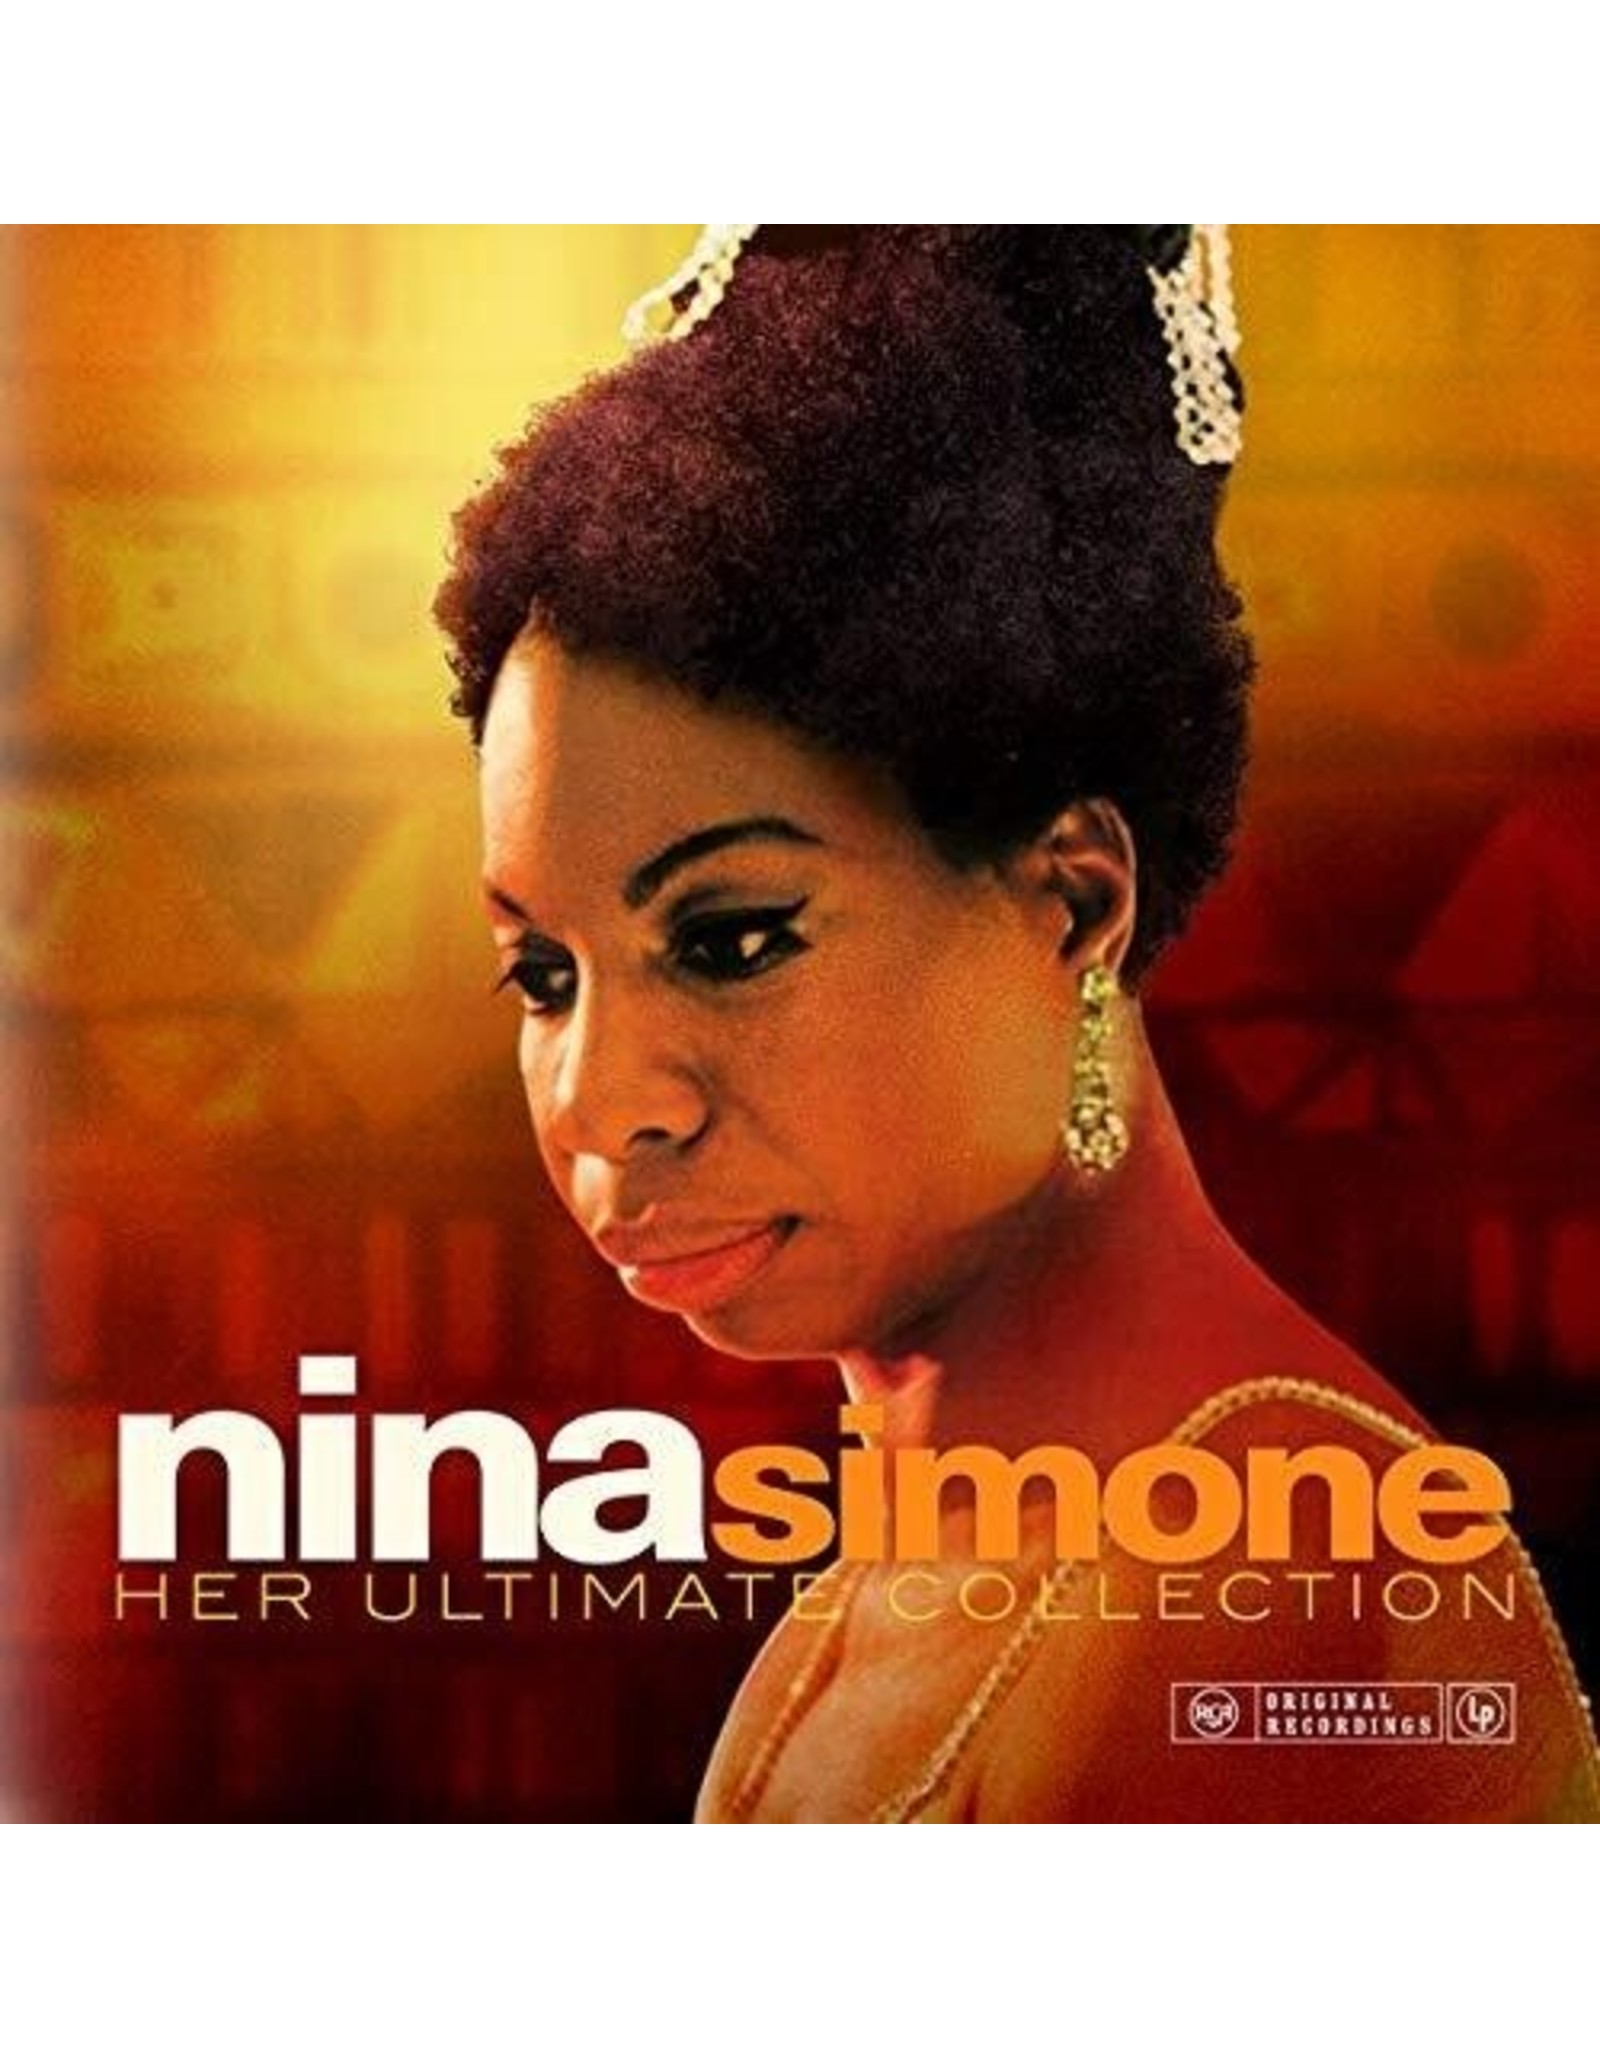 New Vinyl Nina Simone - Her Ultimate Collection LP